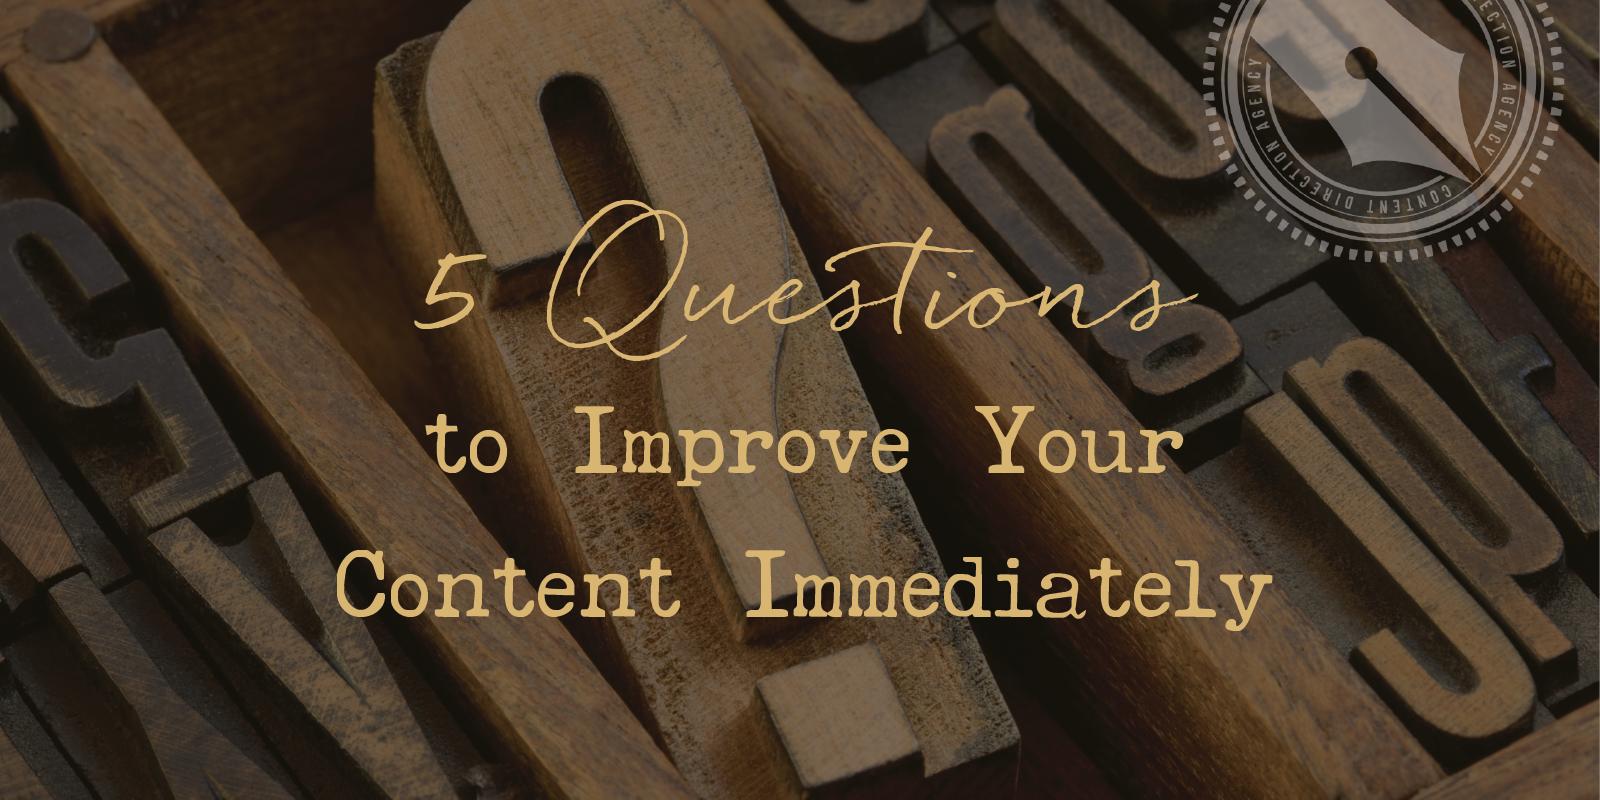 improve content business blogging